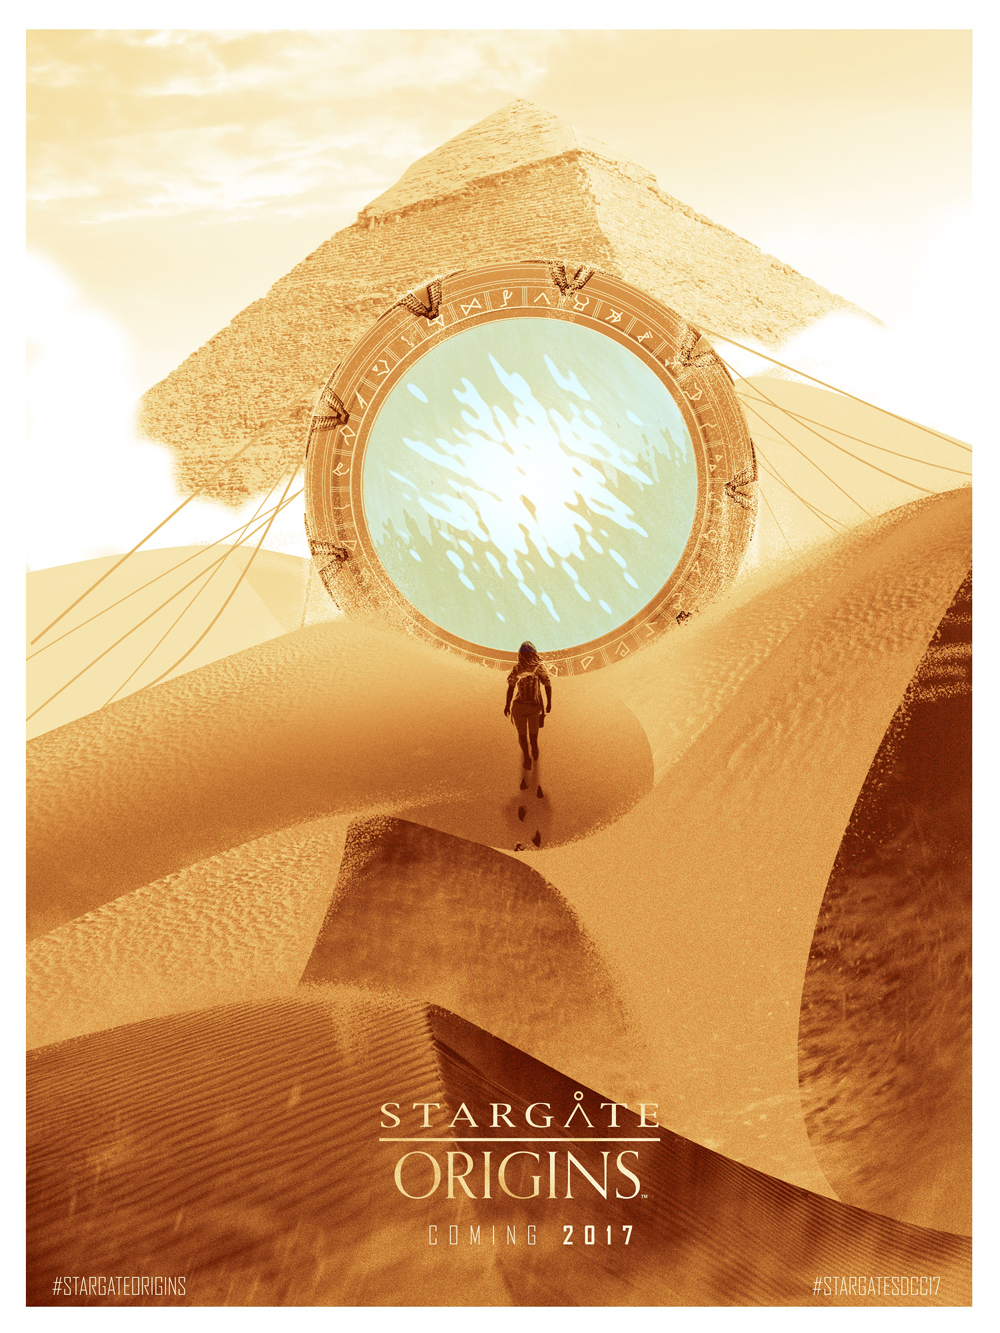 https://static.sorozatjunkie.hu/wp-content/uploads/2017/07/Stargate-Origins-poster.jpg